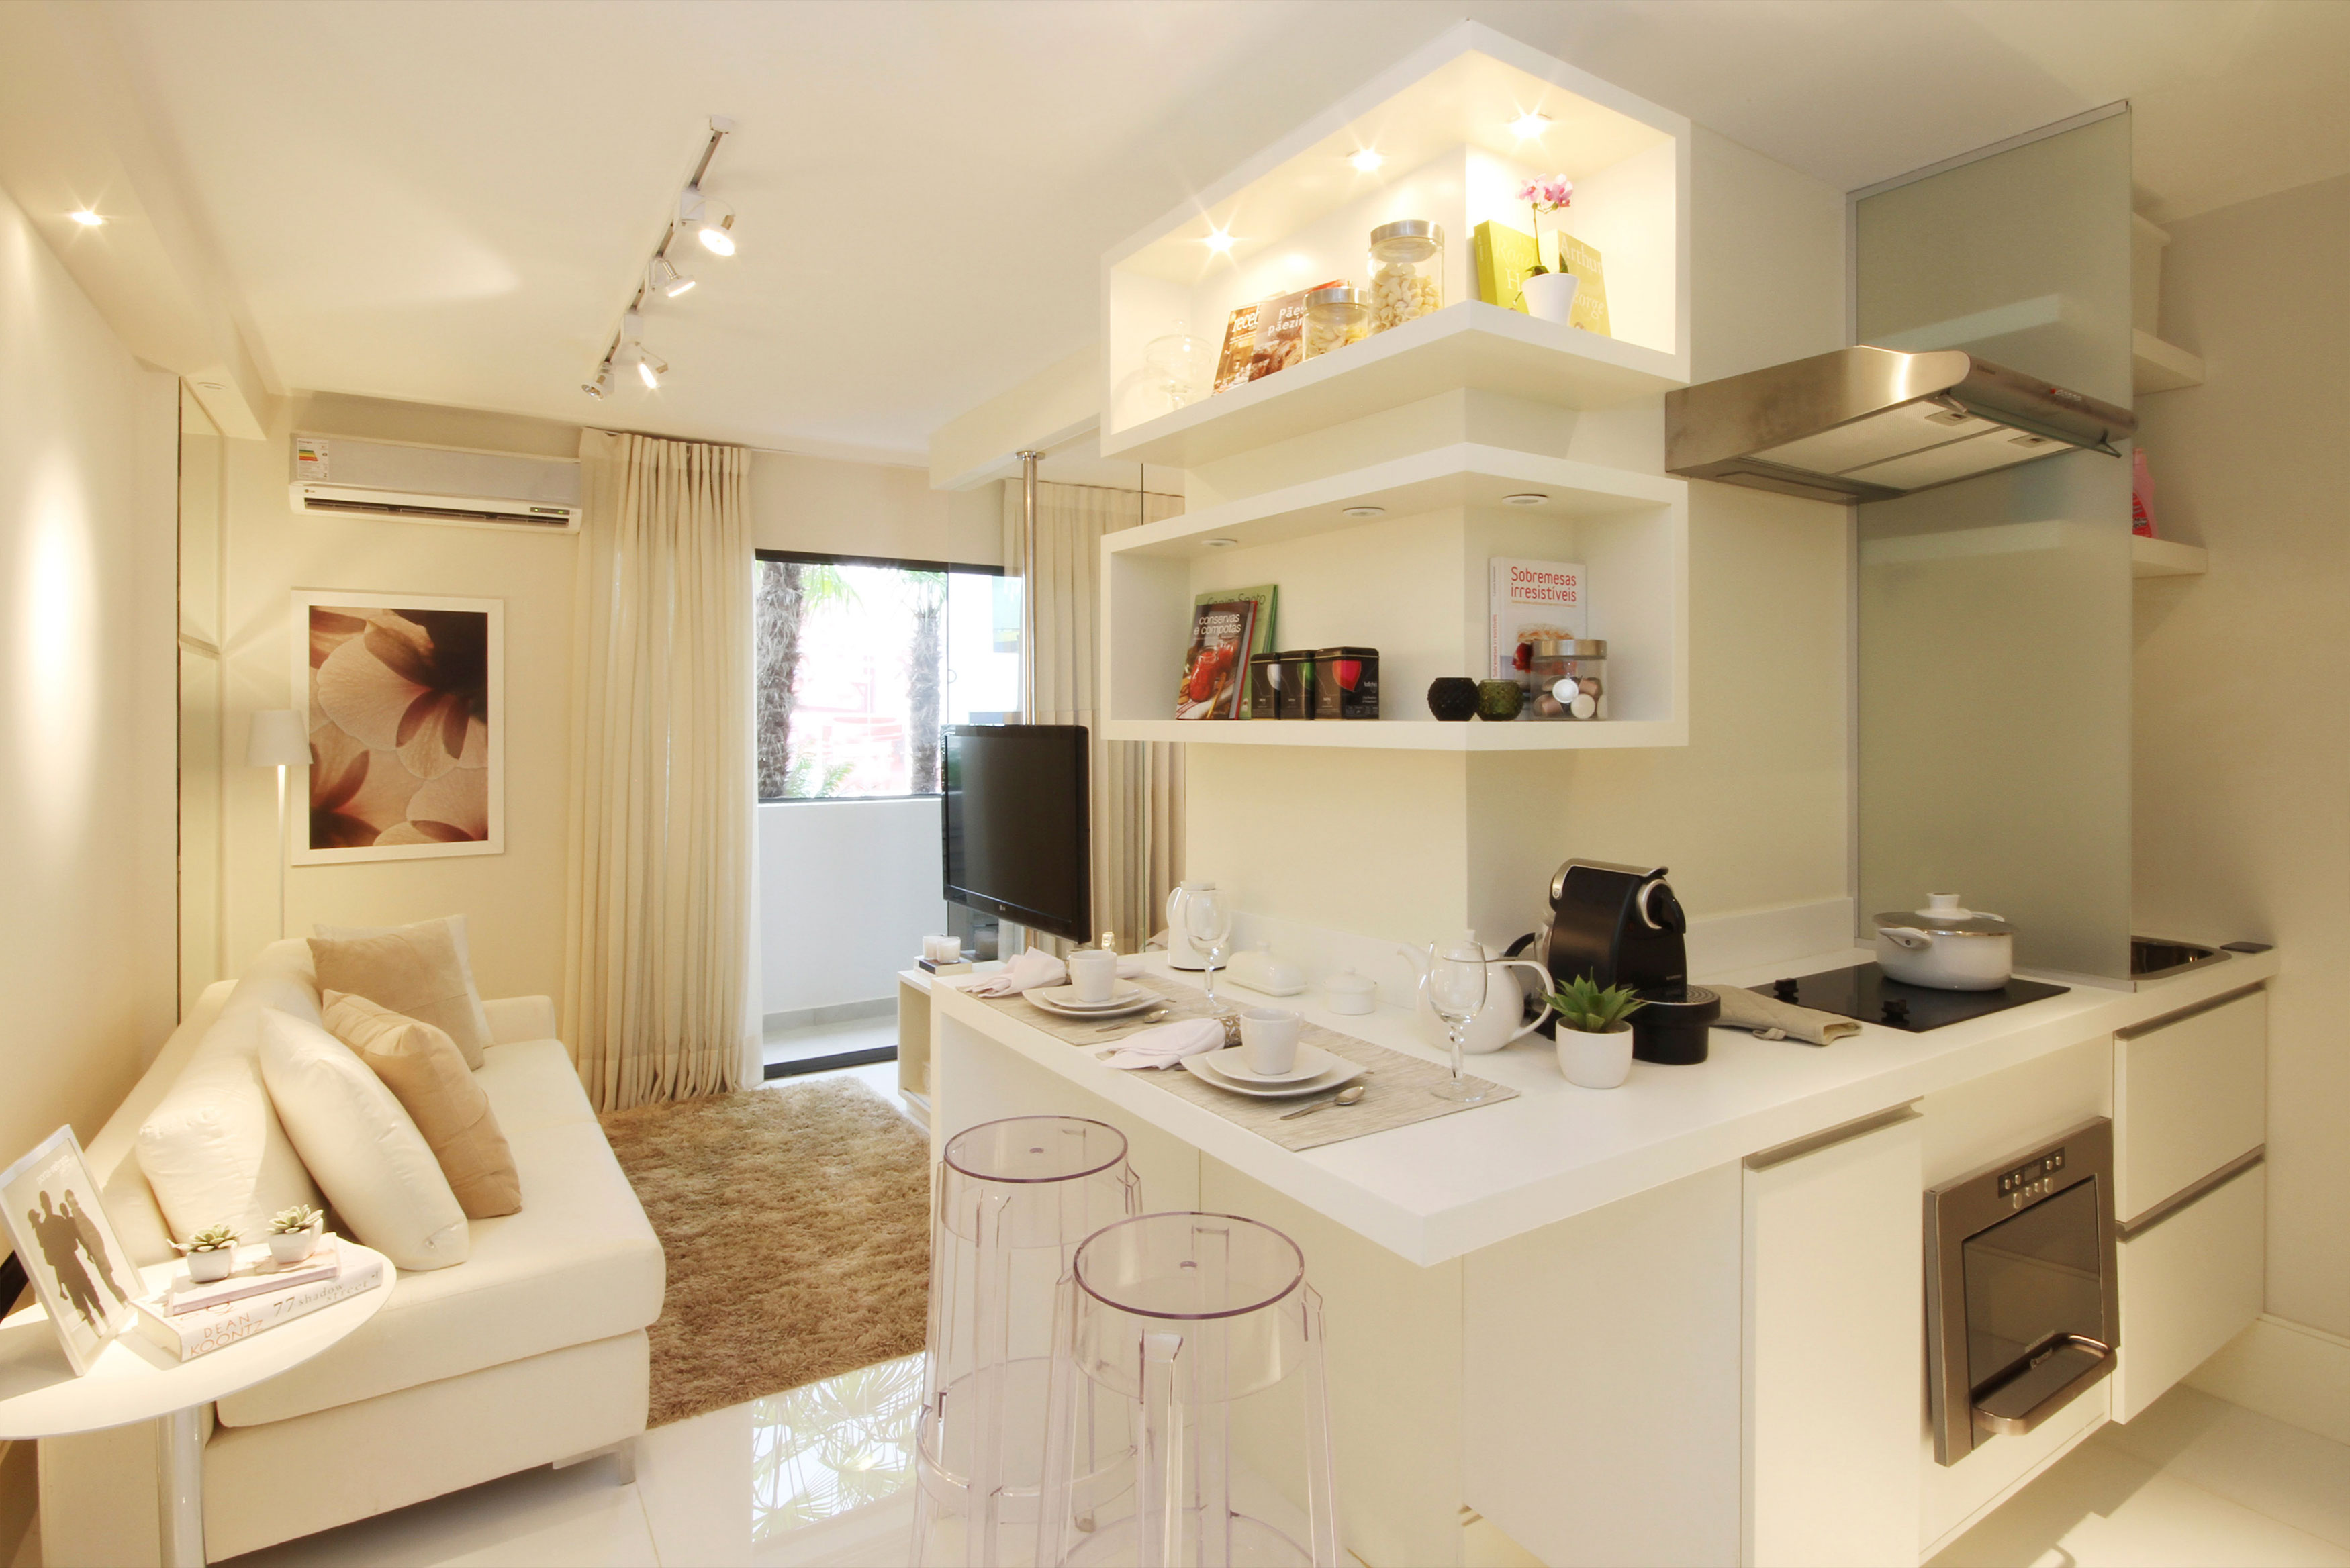 Open space - Cozinha 2